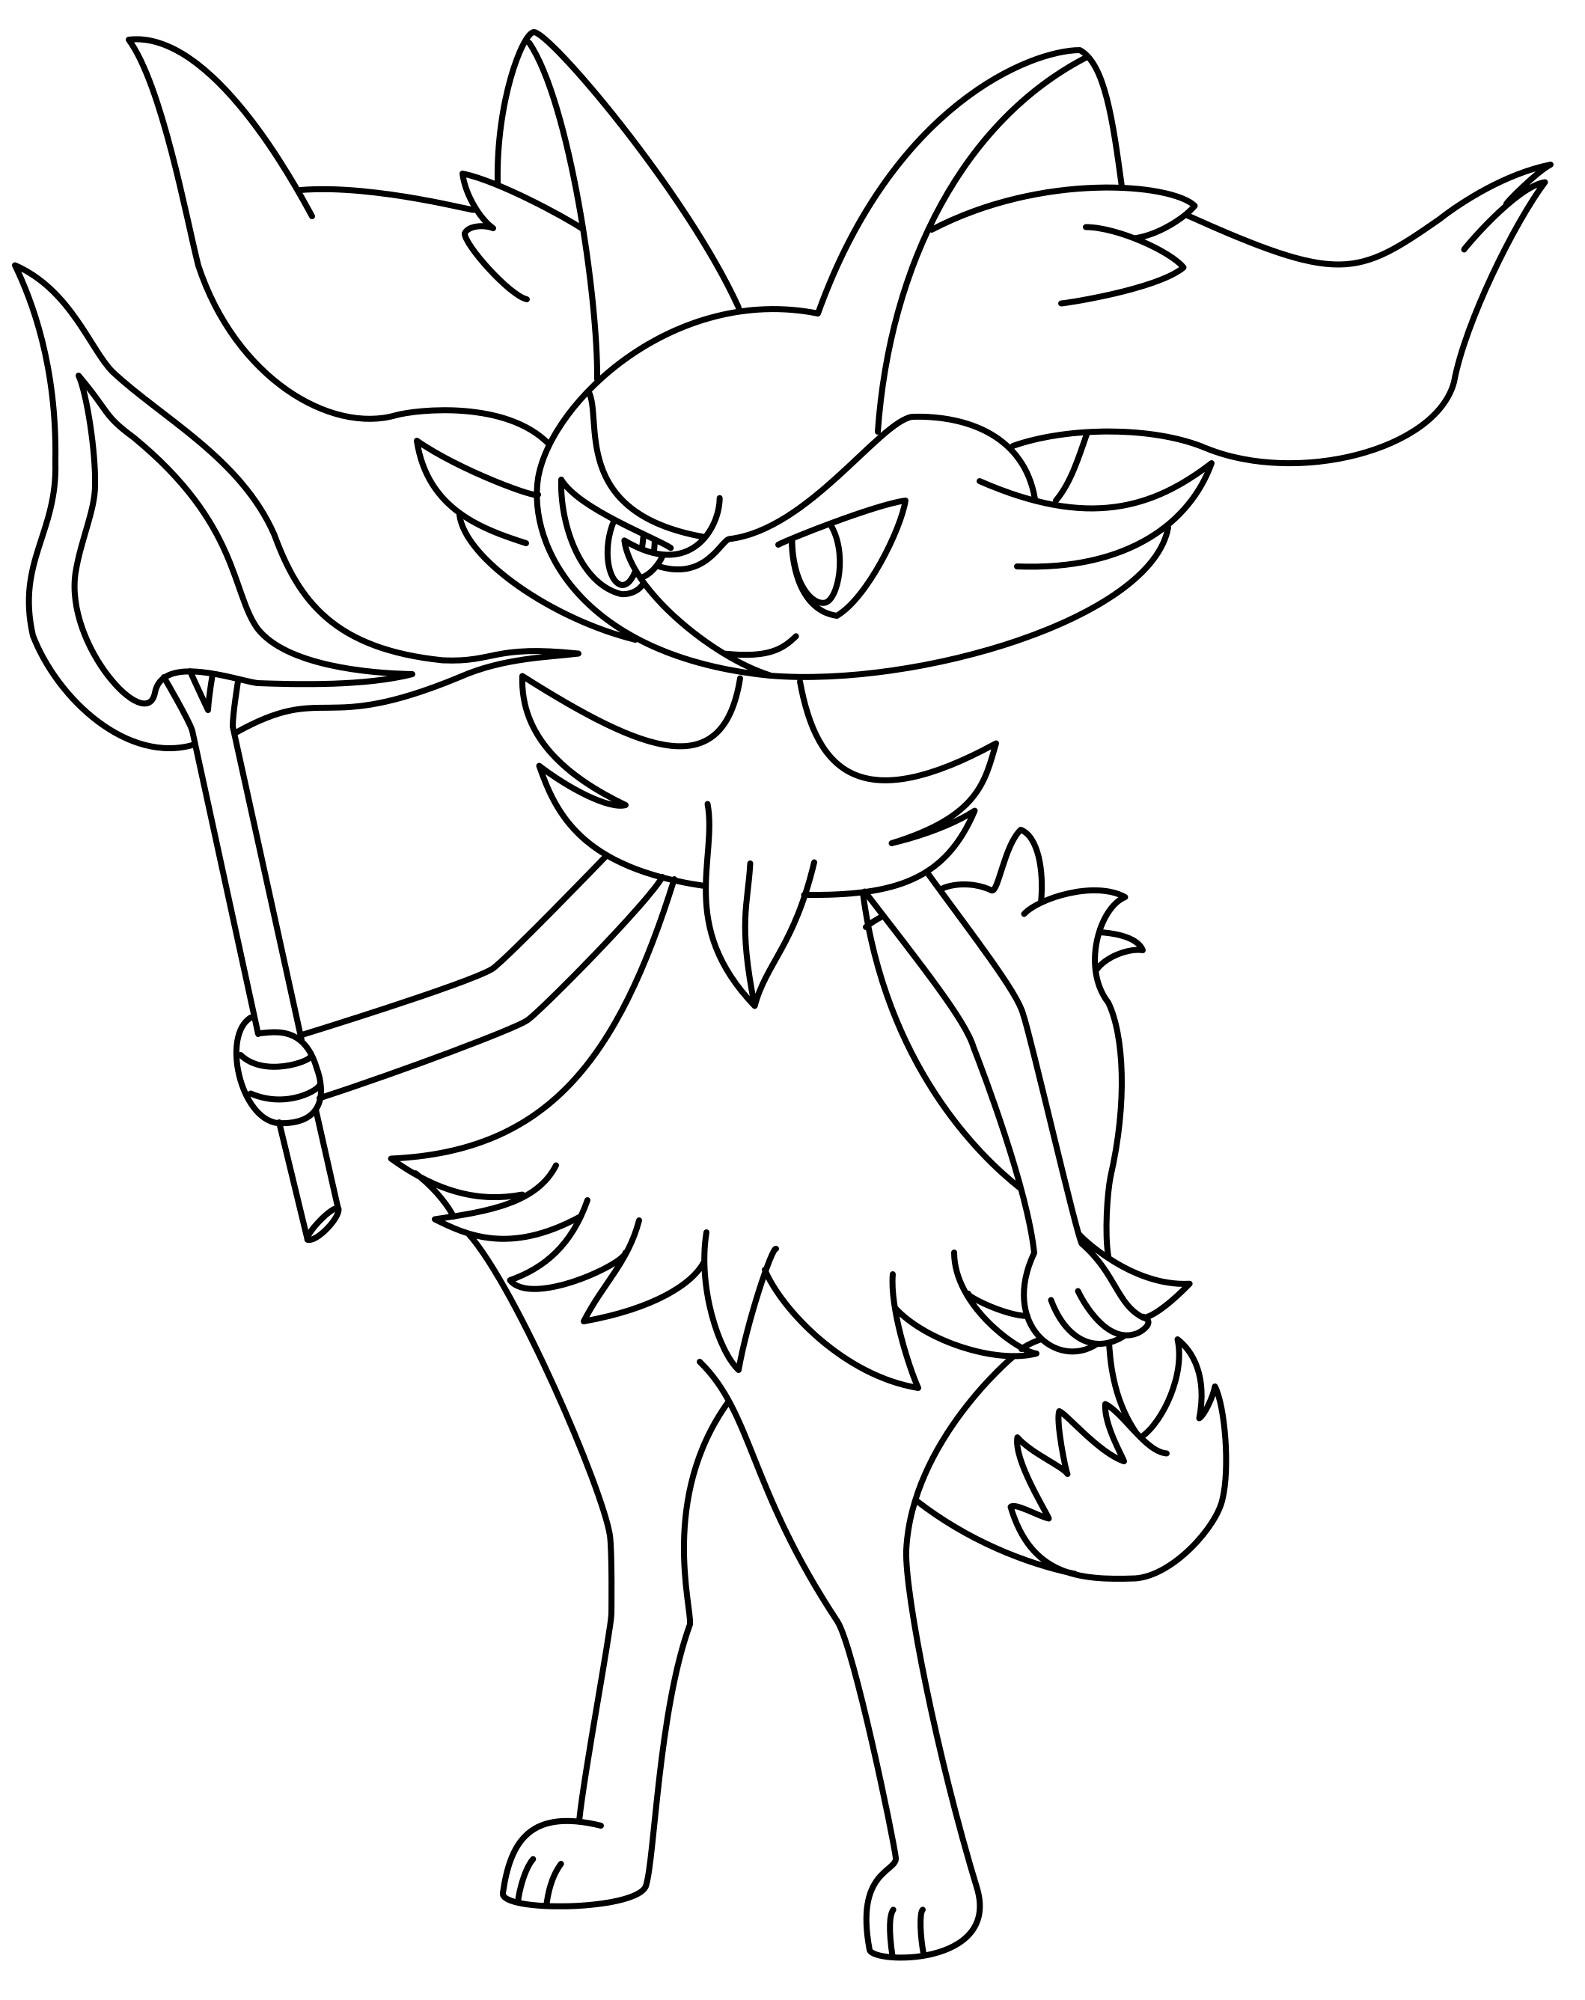 Alle Pokemon Ausmalbilder : Zeichnung Rutena Ausmalbild Pok Mon Fanart